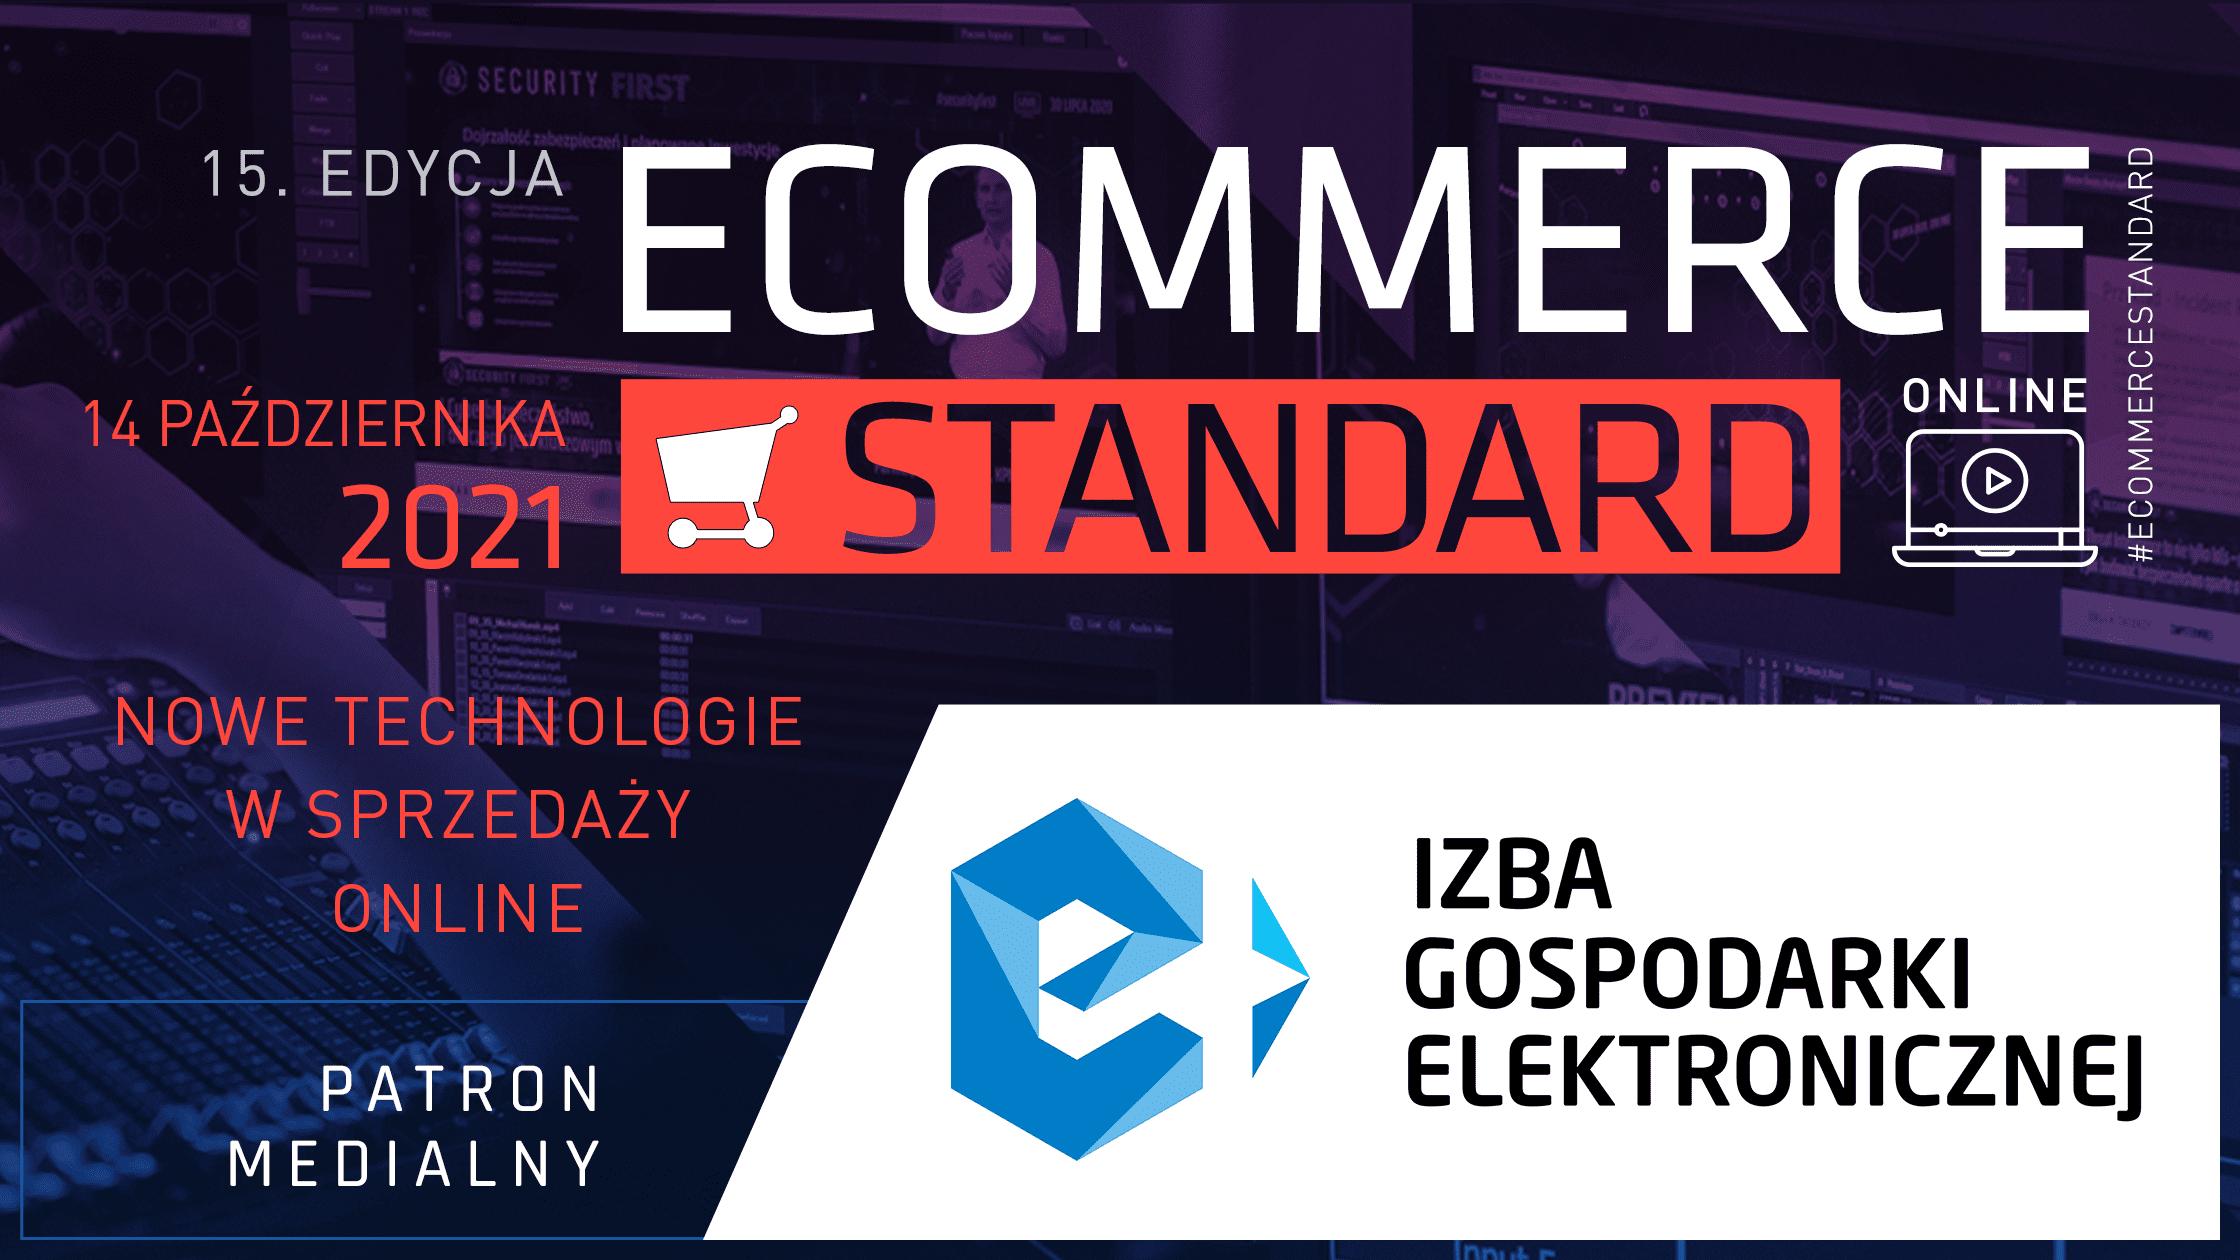 Konferencja E-commerce Standard, pod patronatem e-Izby.